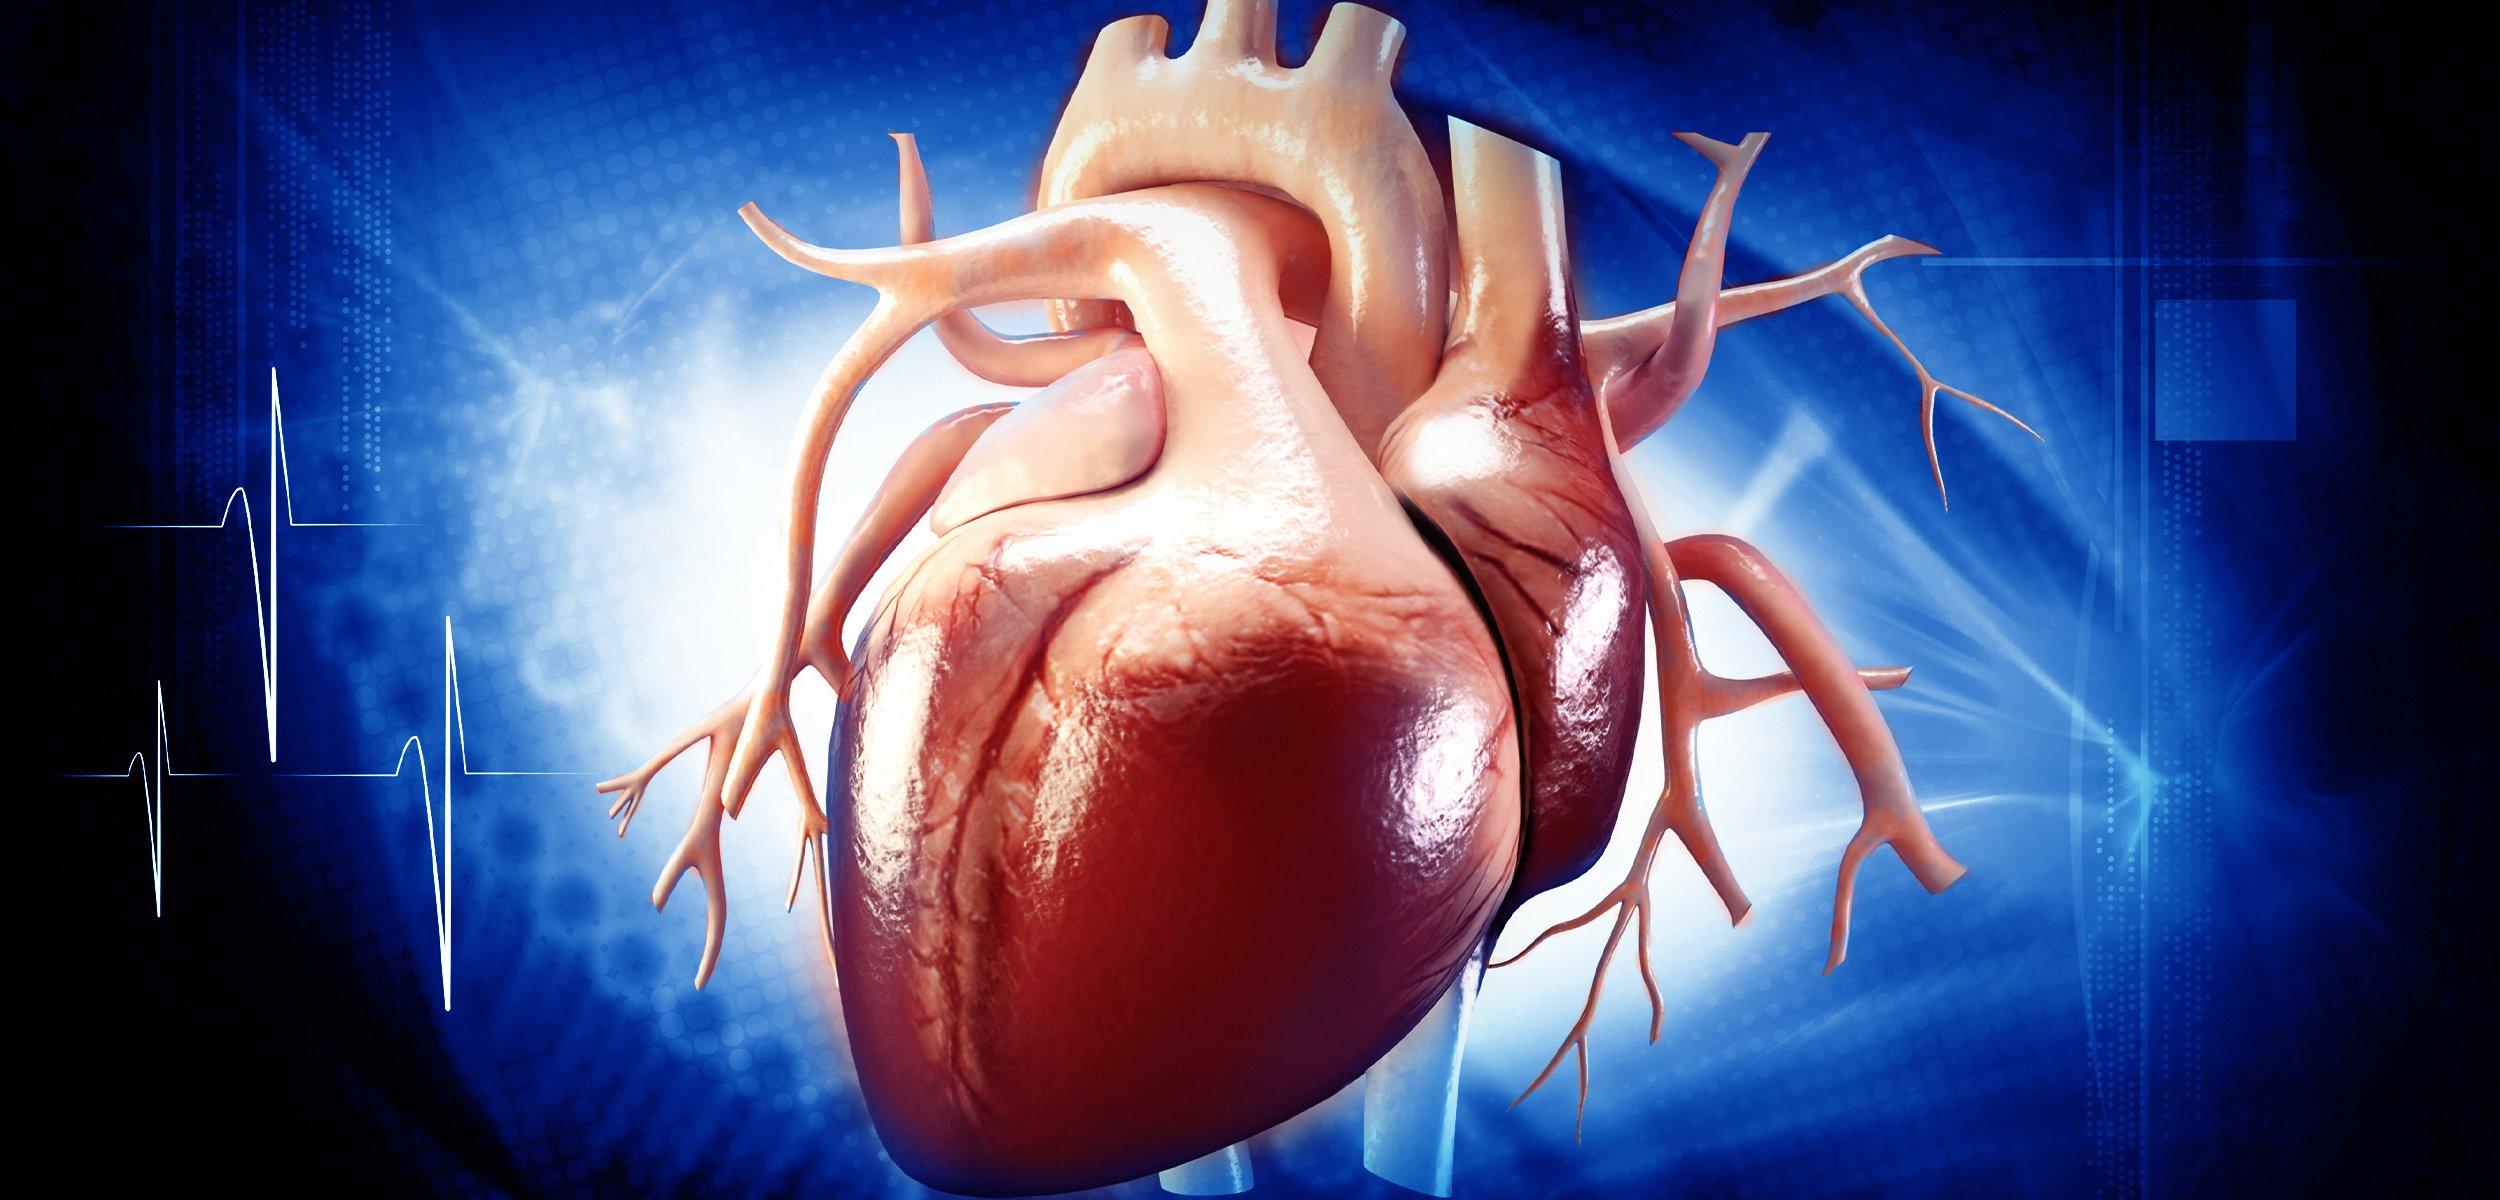 Koroner angioplastika